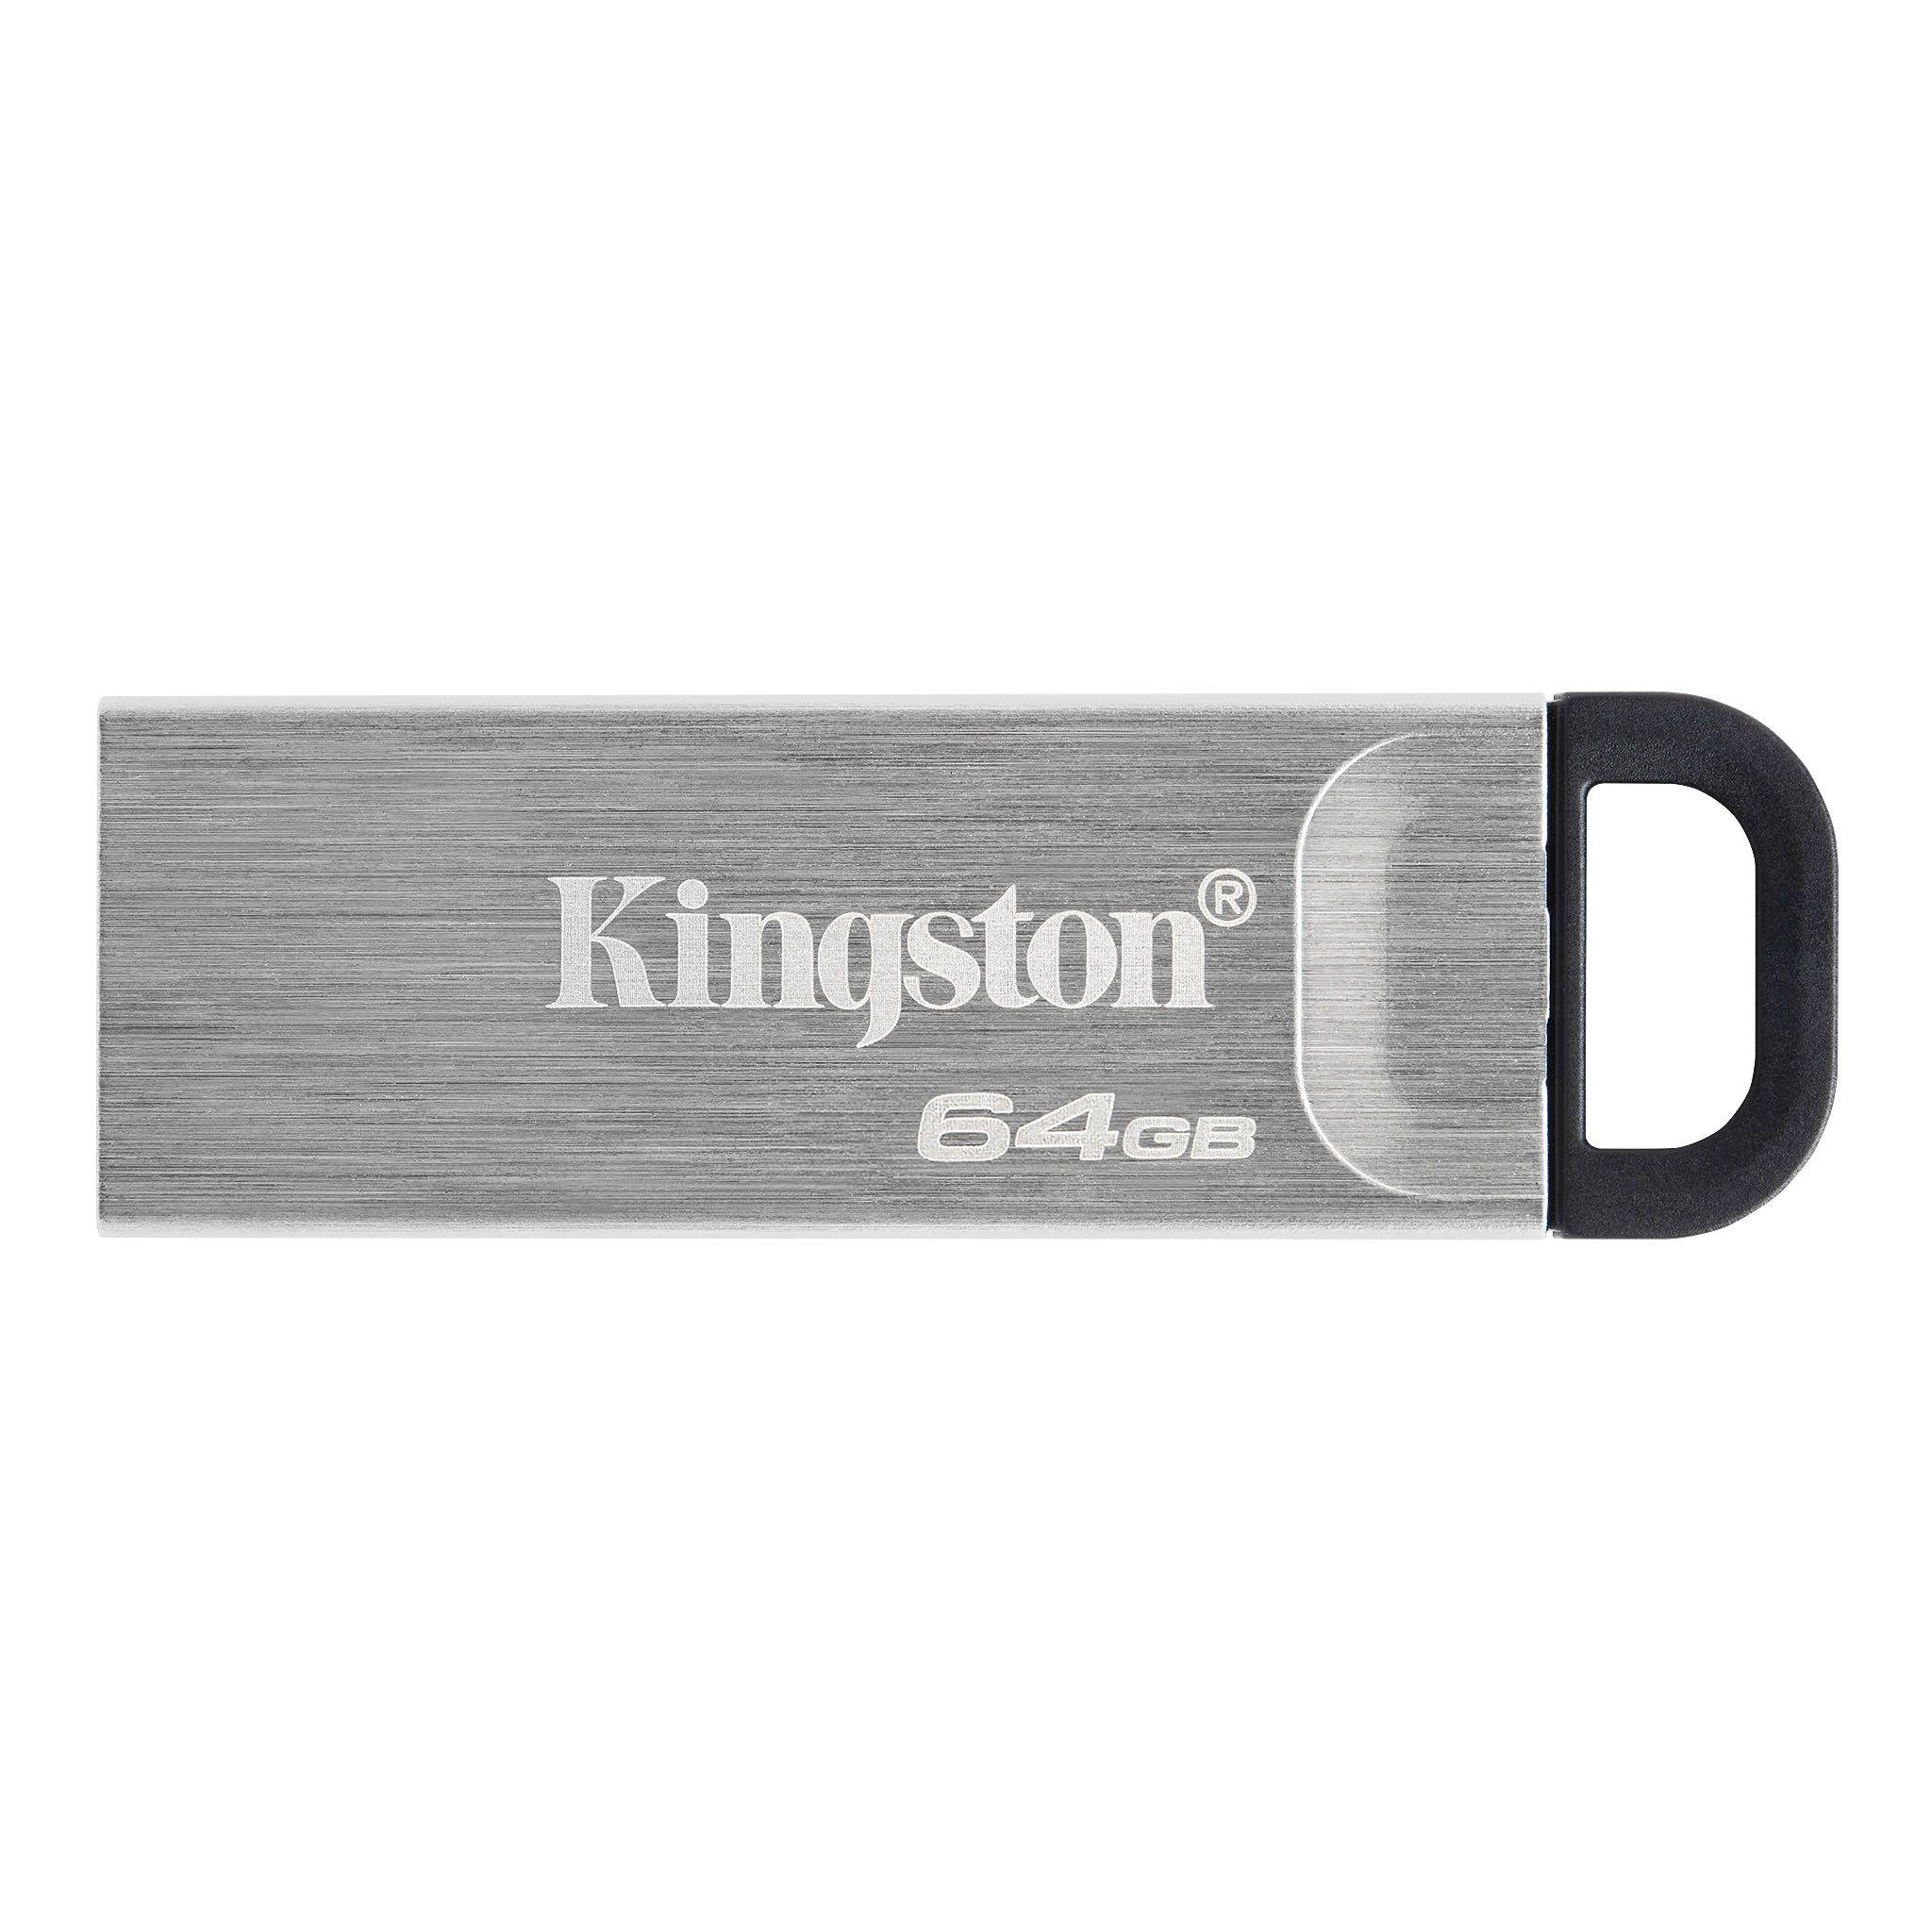 64GB Kingston USB 3.2 (gen 1) DT Kyson